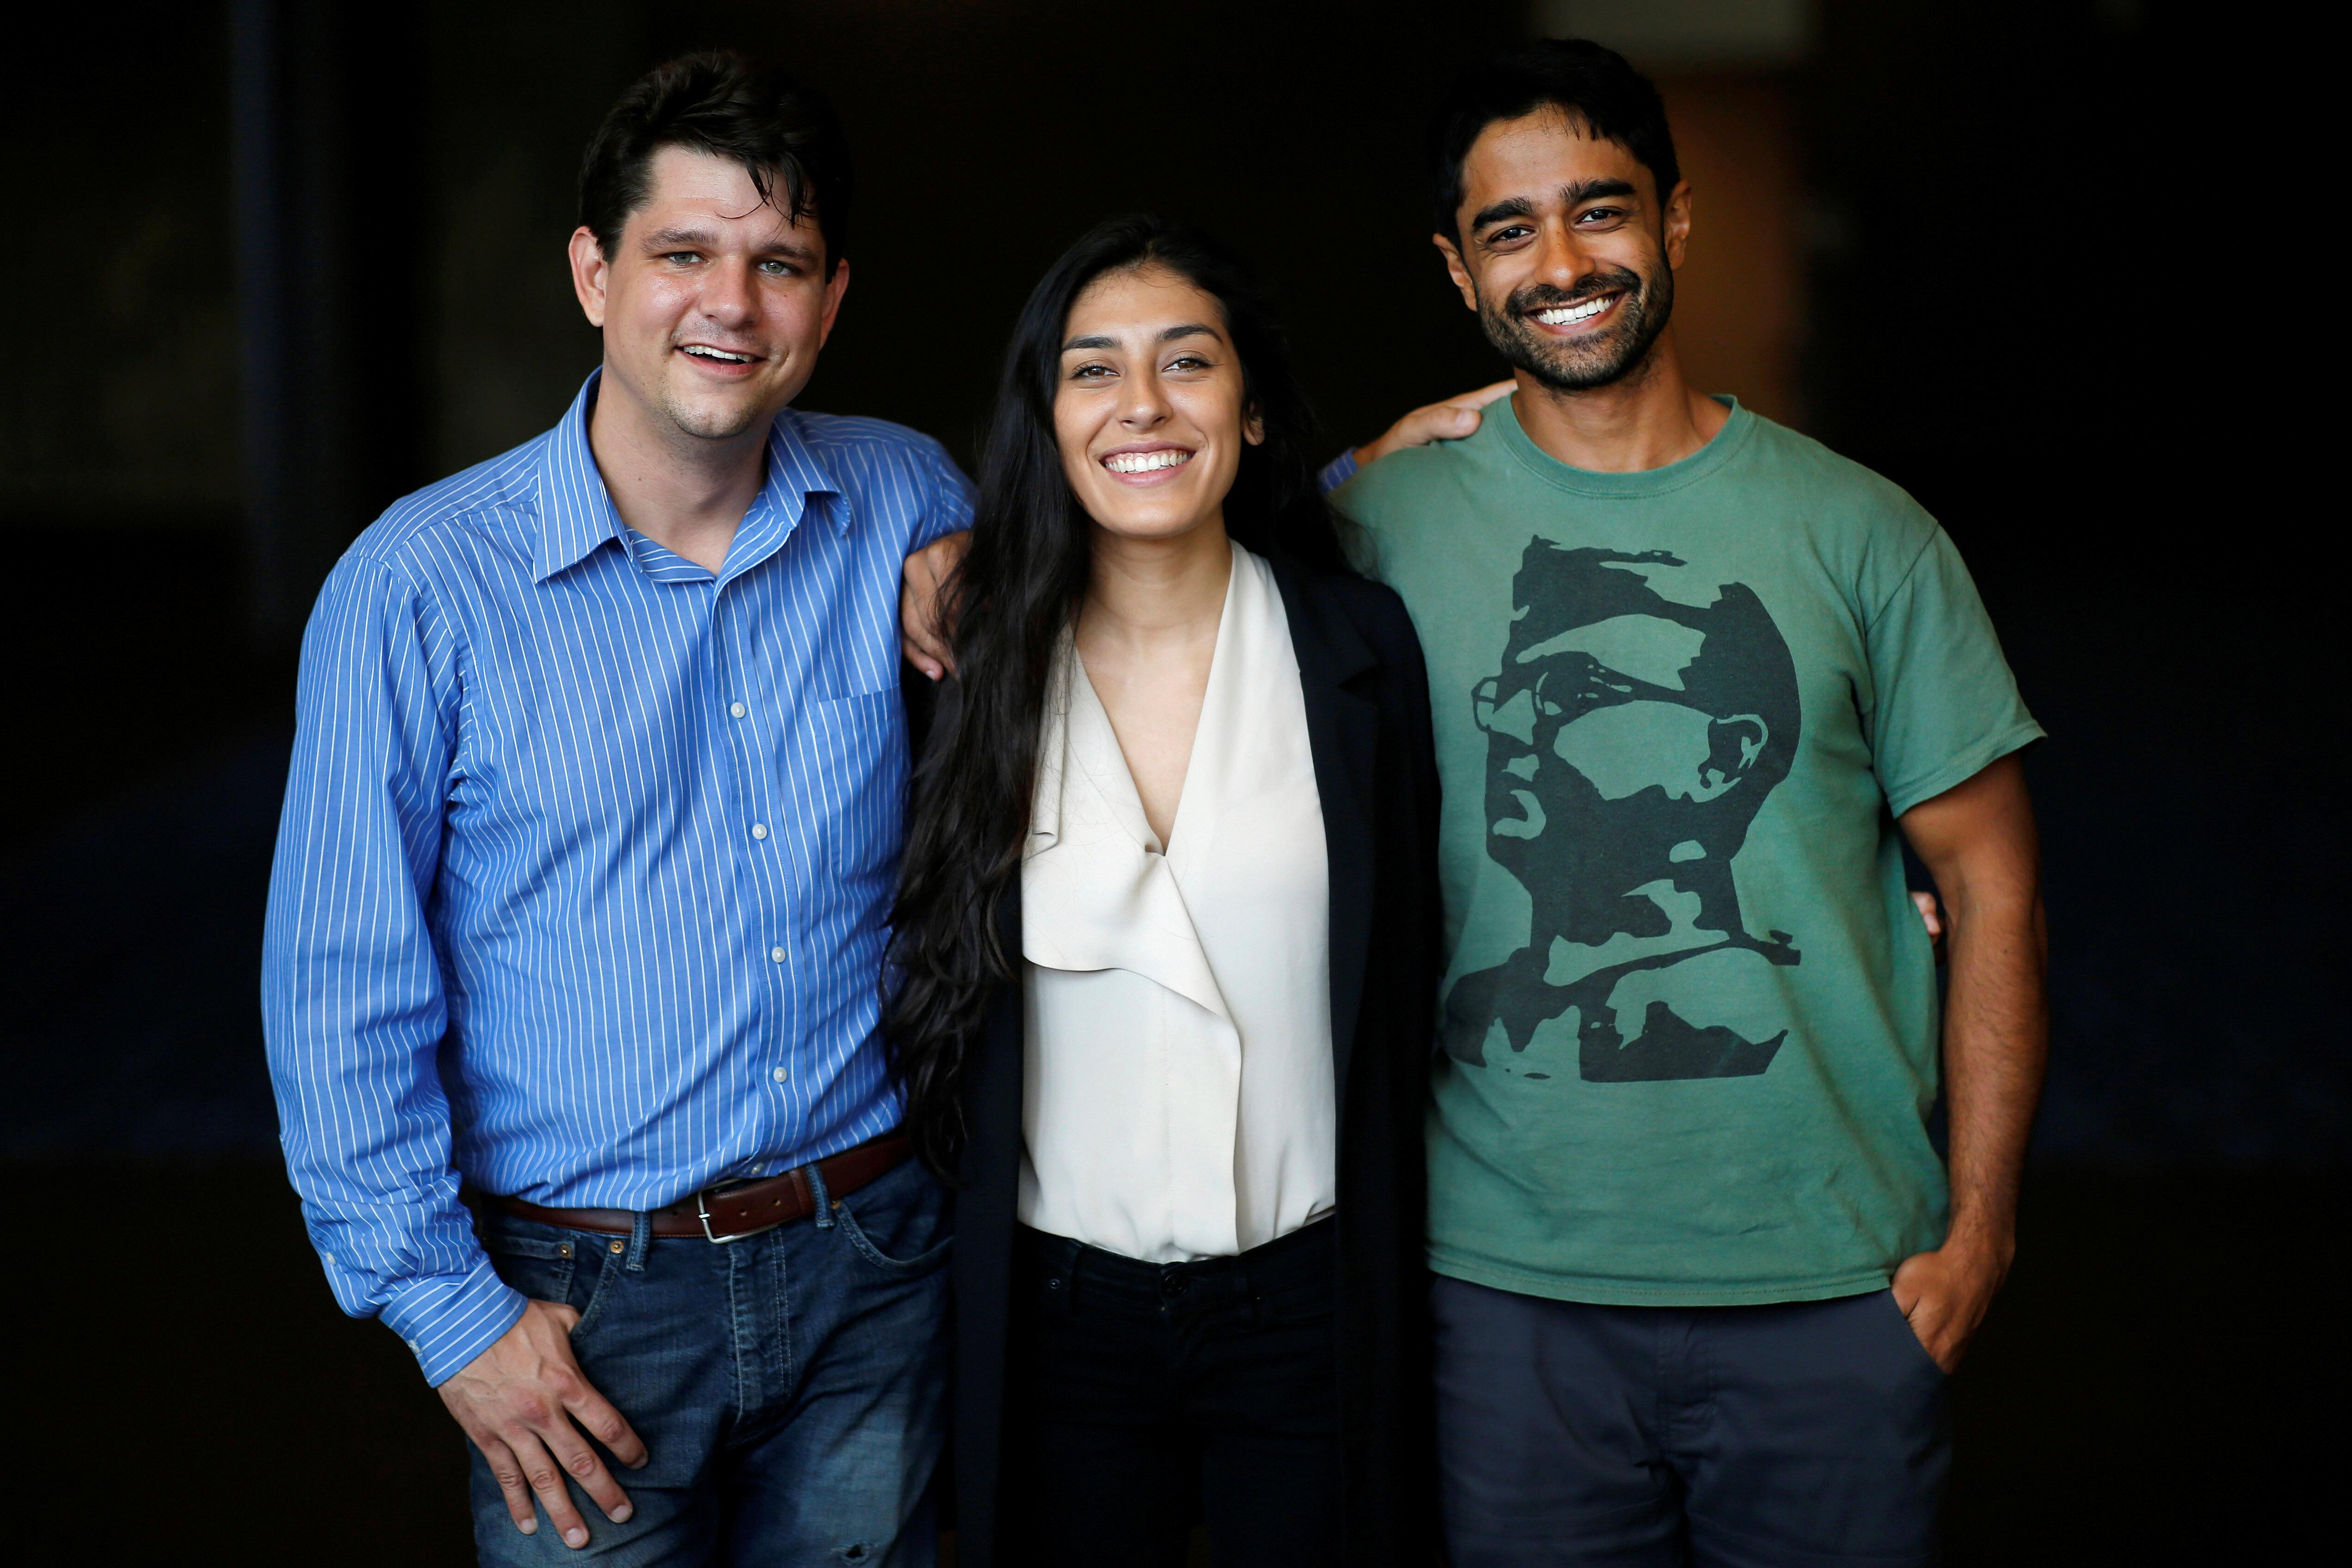 Corbin Trent, Alexandra Rojas and Saikat Chakrabarti of Justice Democrats